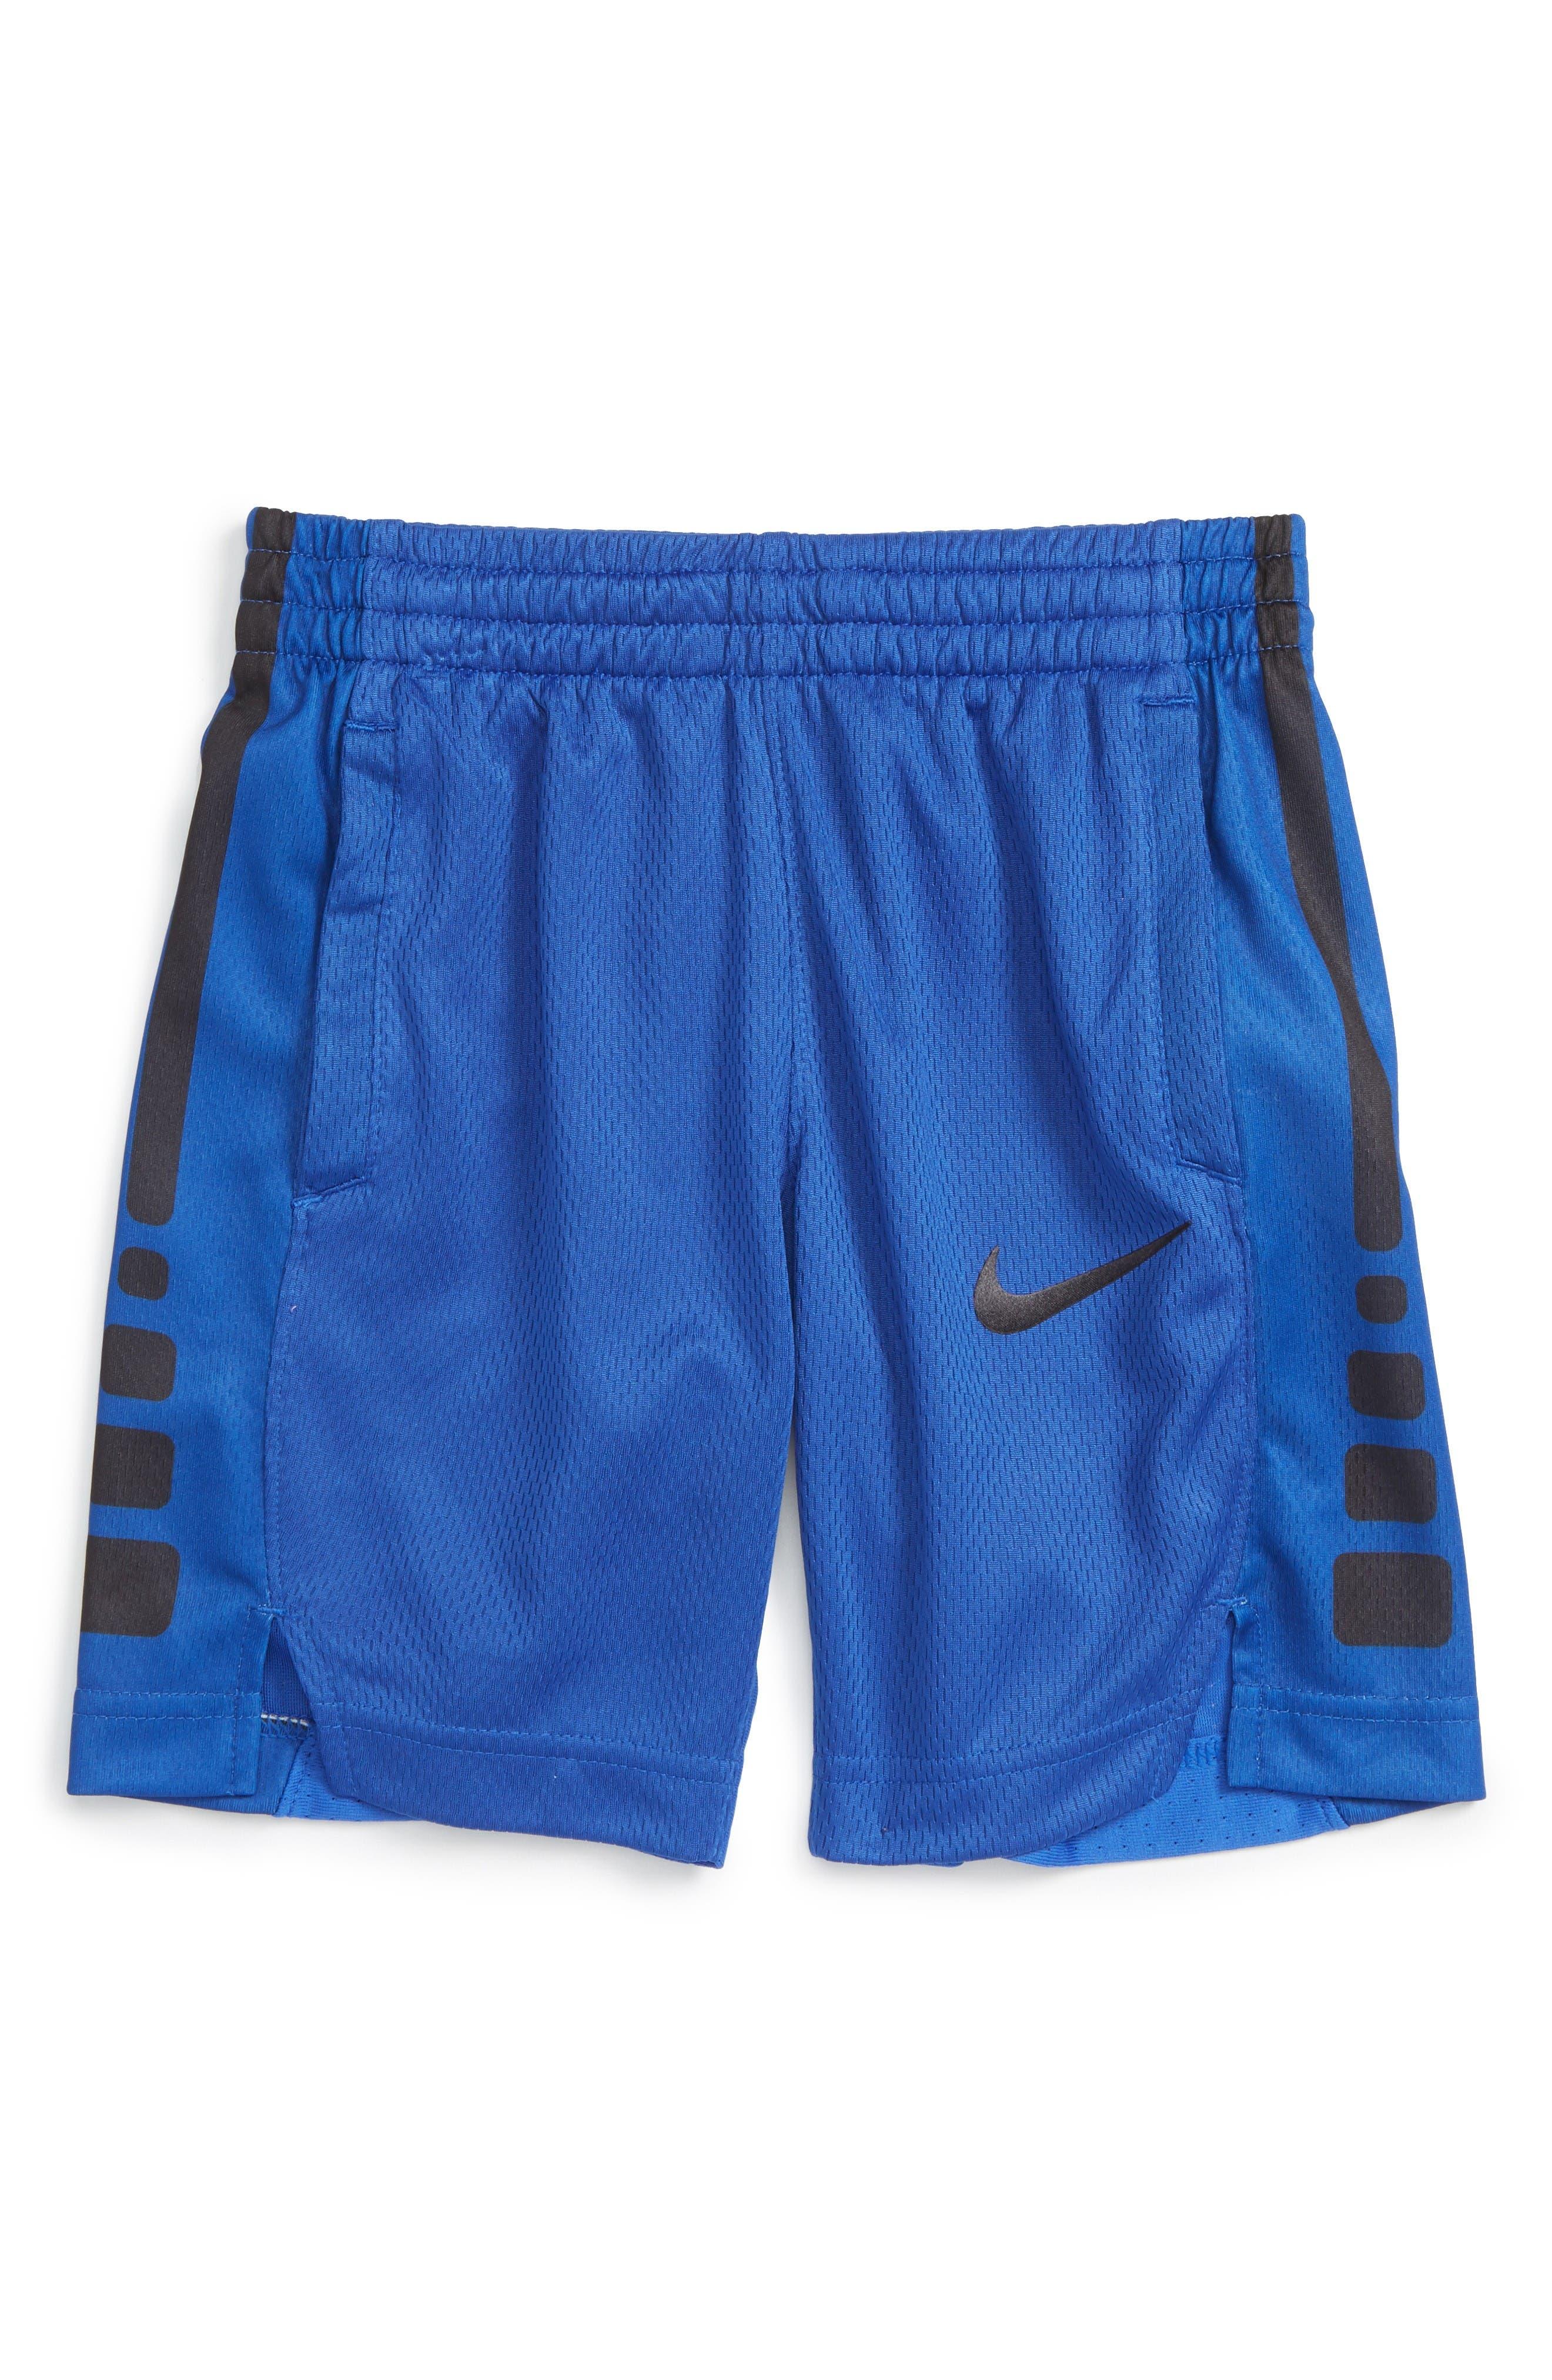 Elite Stripe Shorts,                         Main,                         color, Game Royal